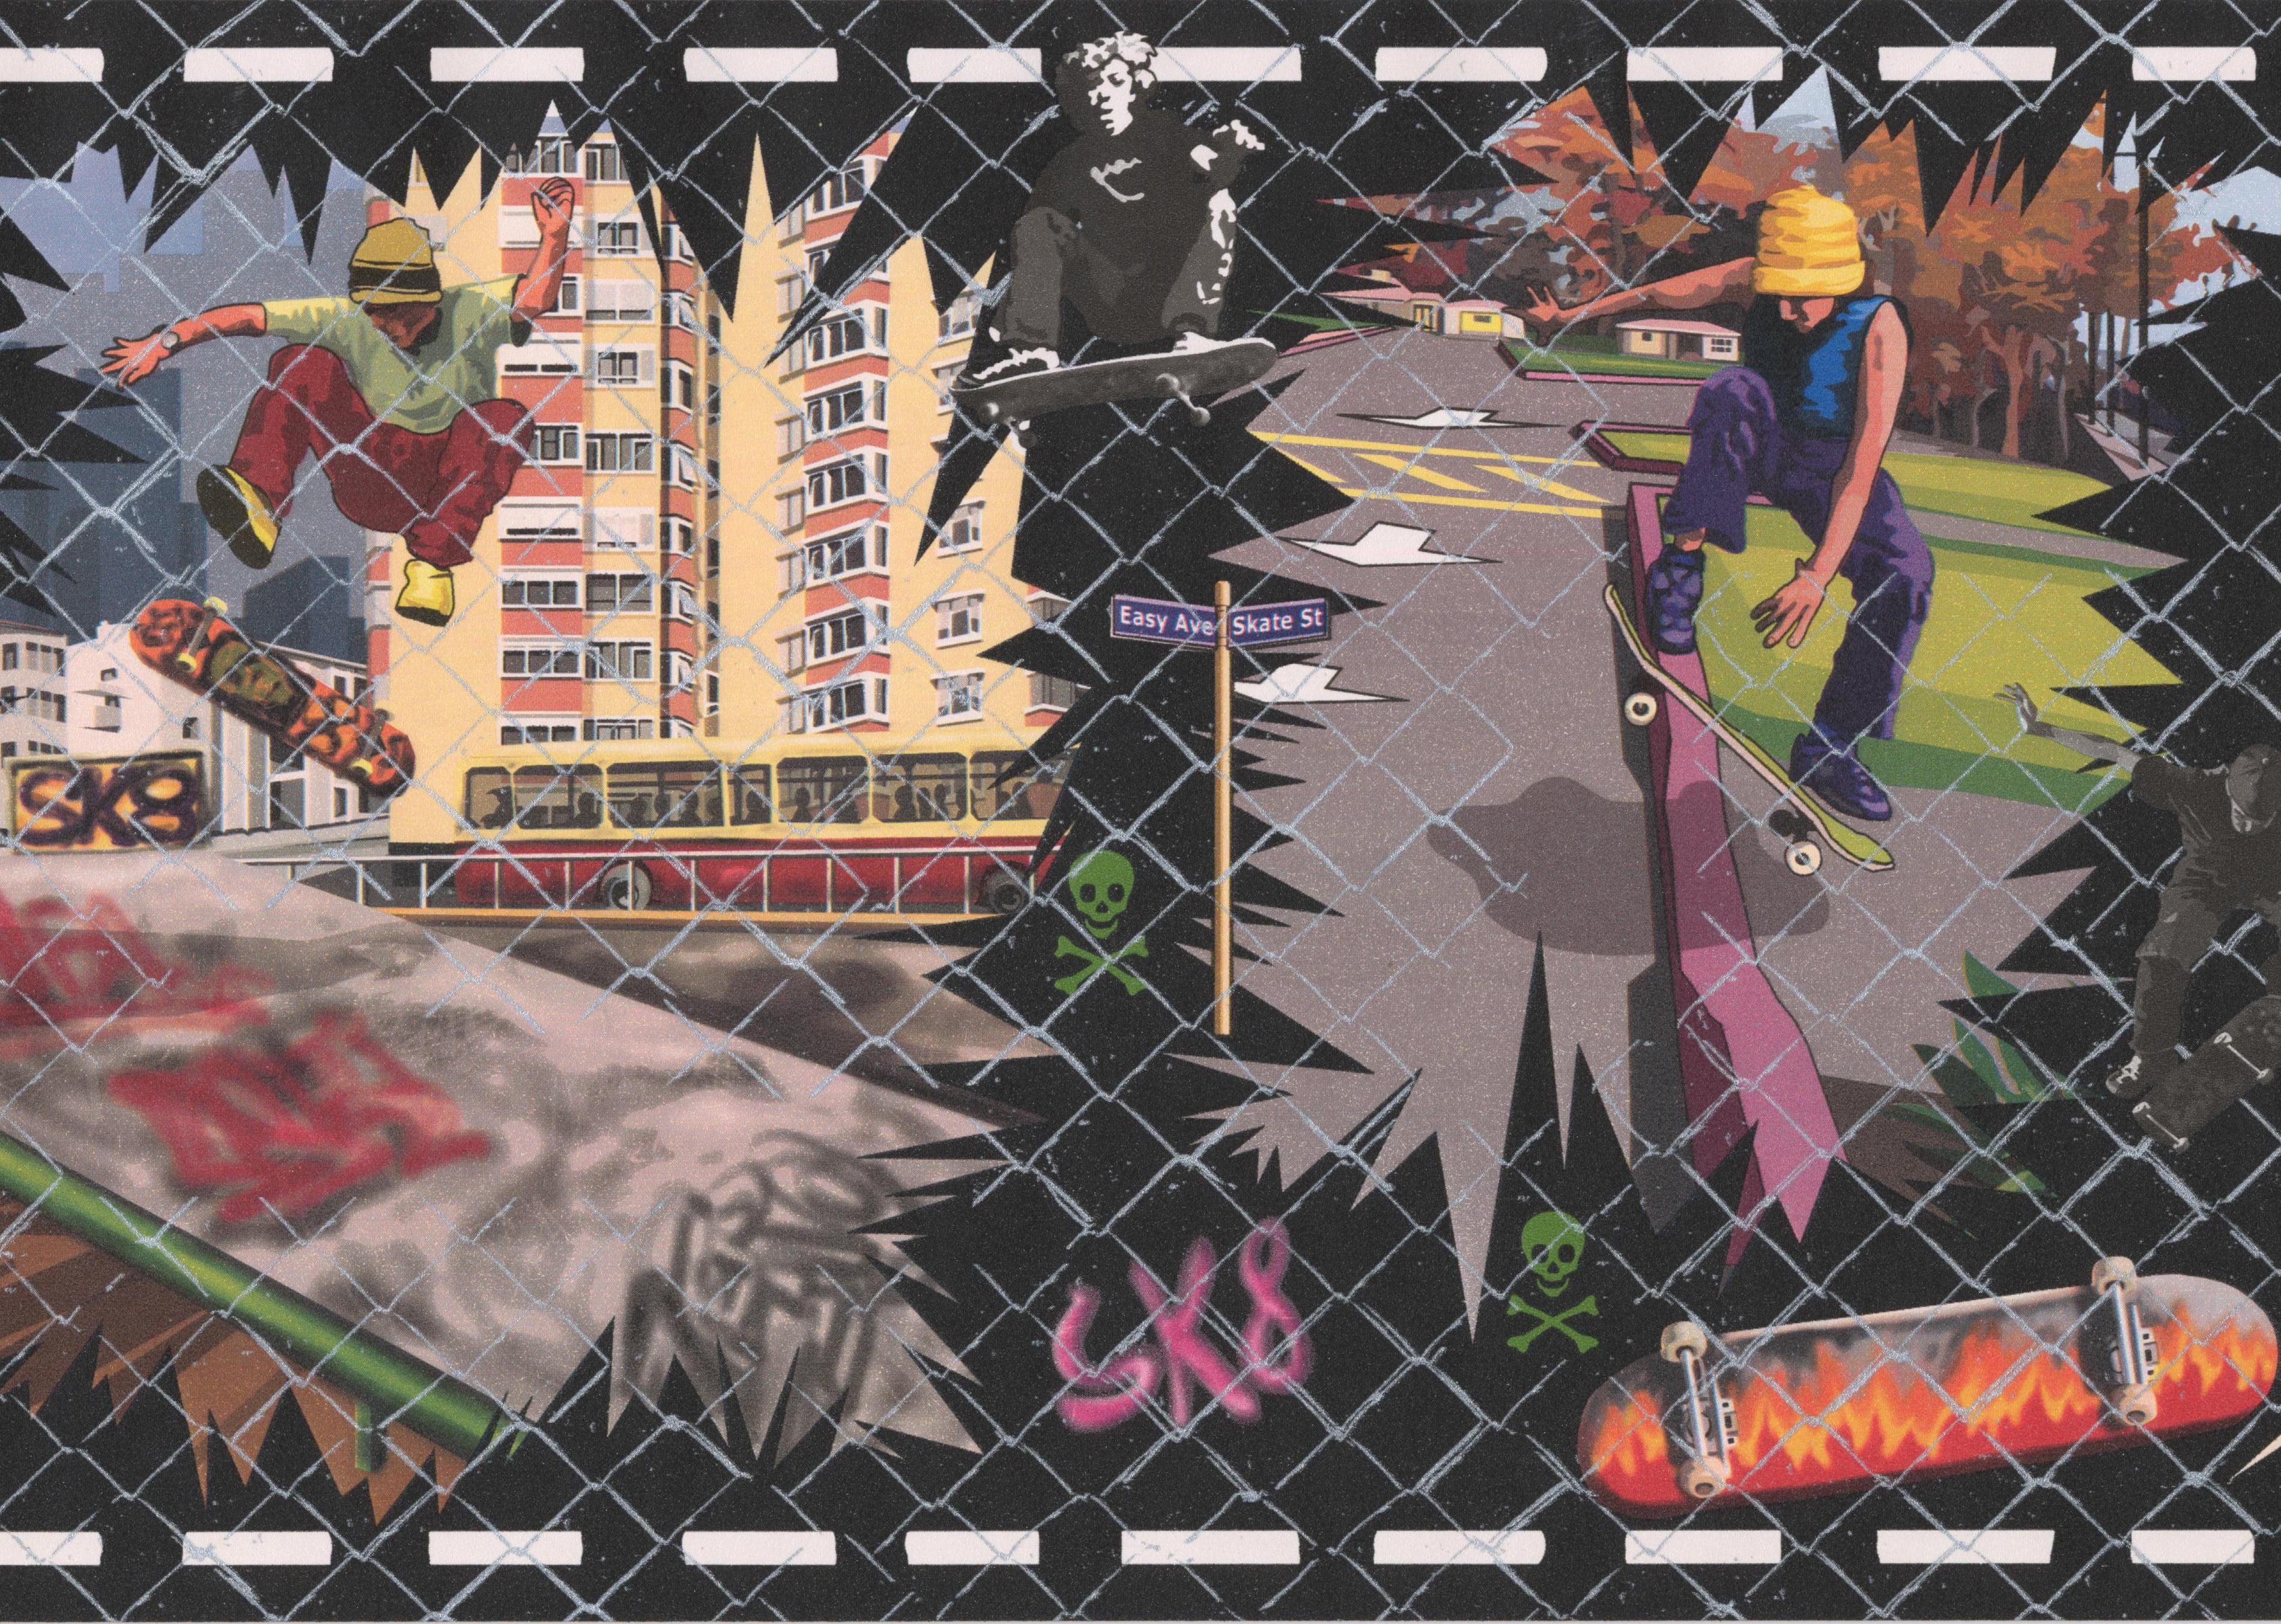 Wallpaper Border - Teens on Skateboards Wall Border Urban ...